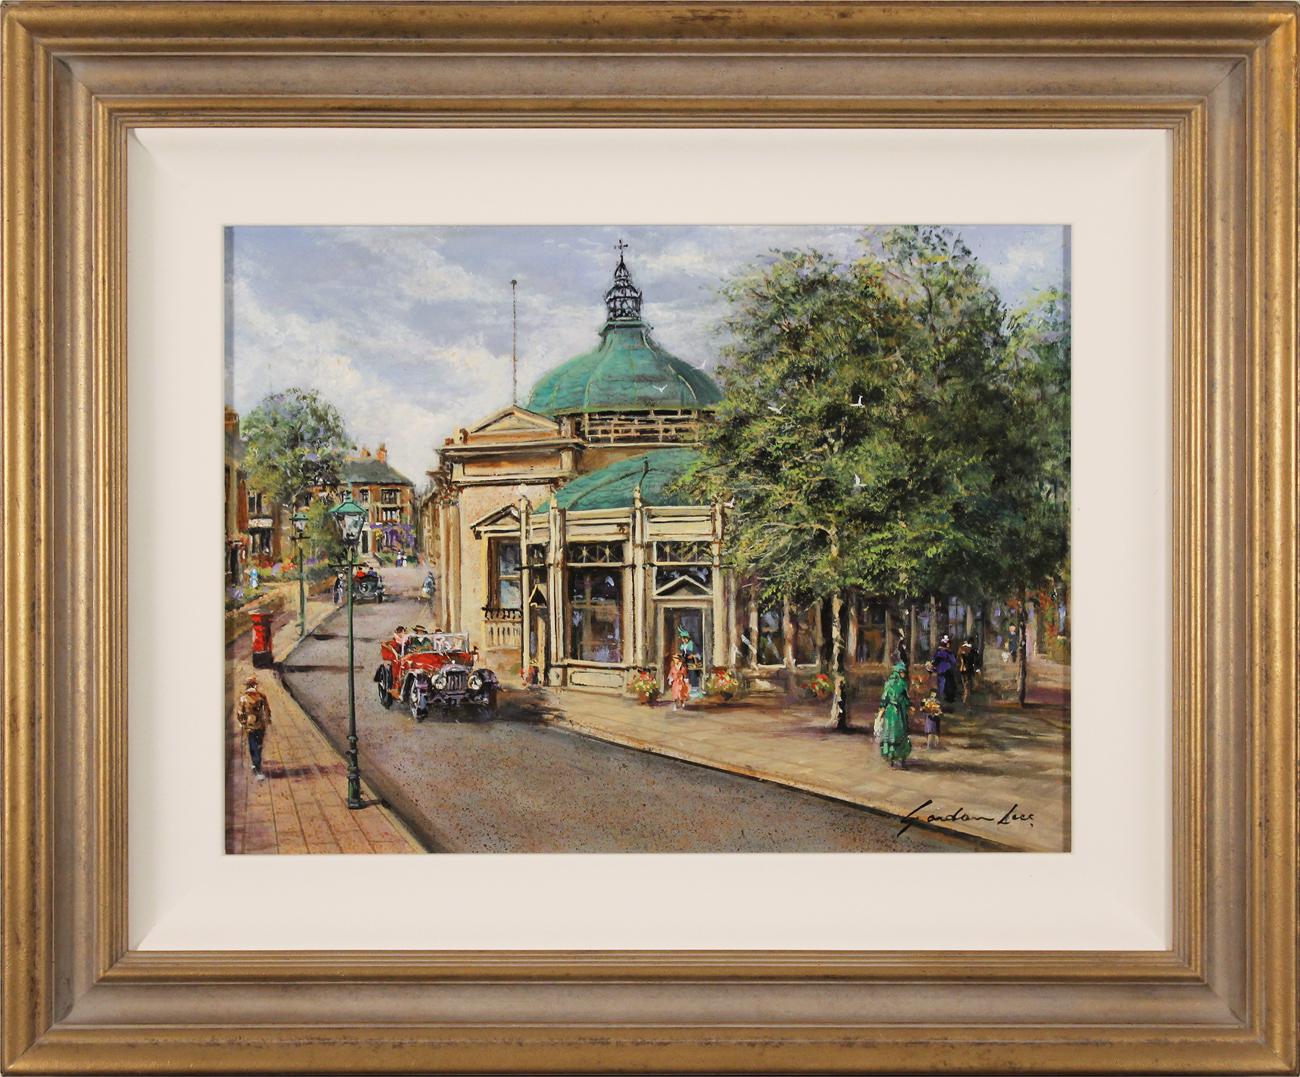 Gordon Lees, Original oil painting on panel, The Royal Pump Room, Harrogate Click to enlarge